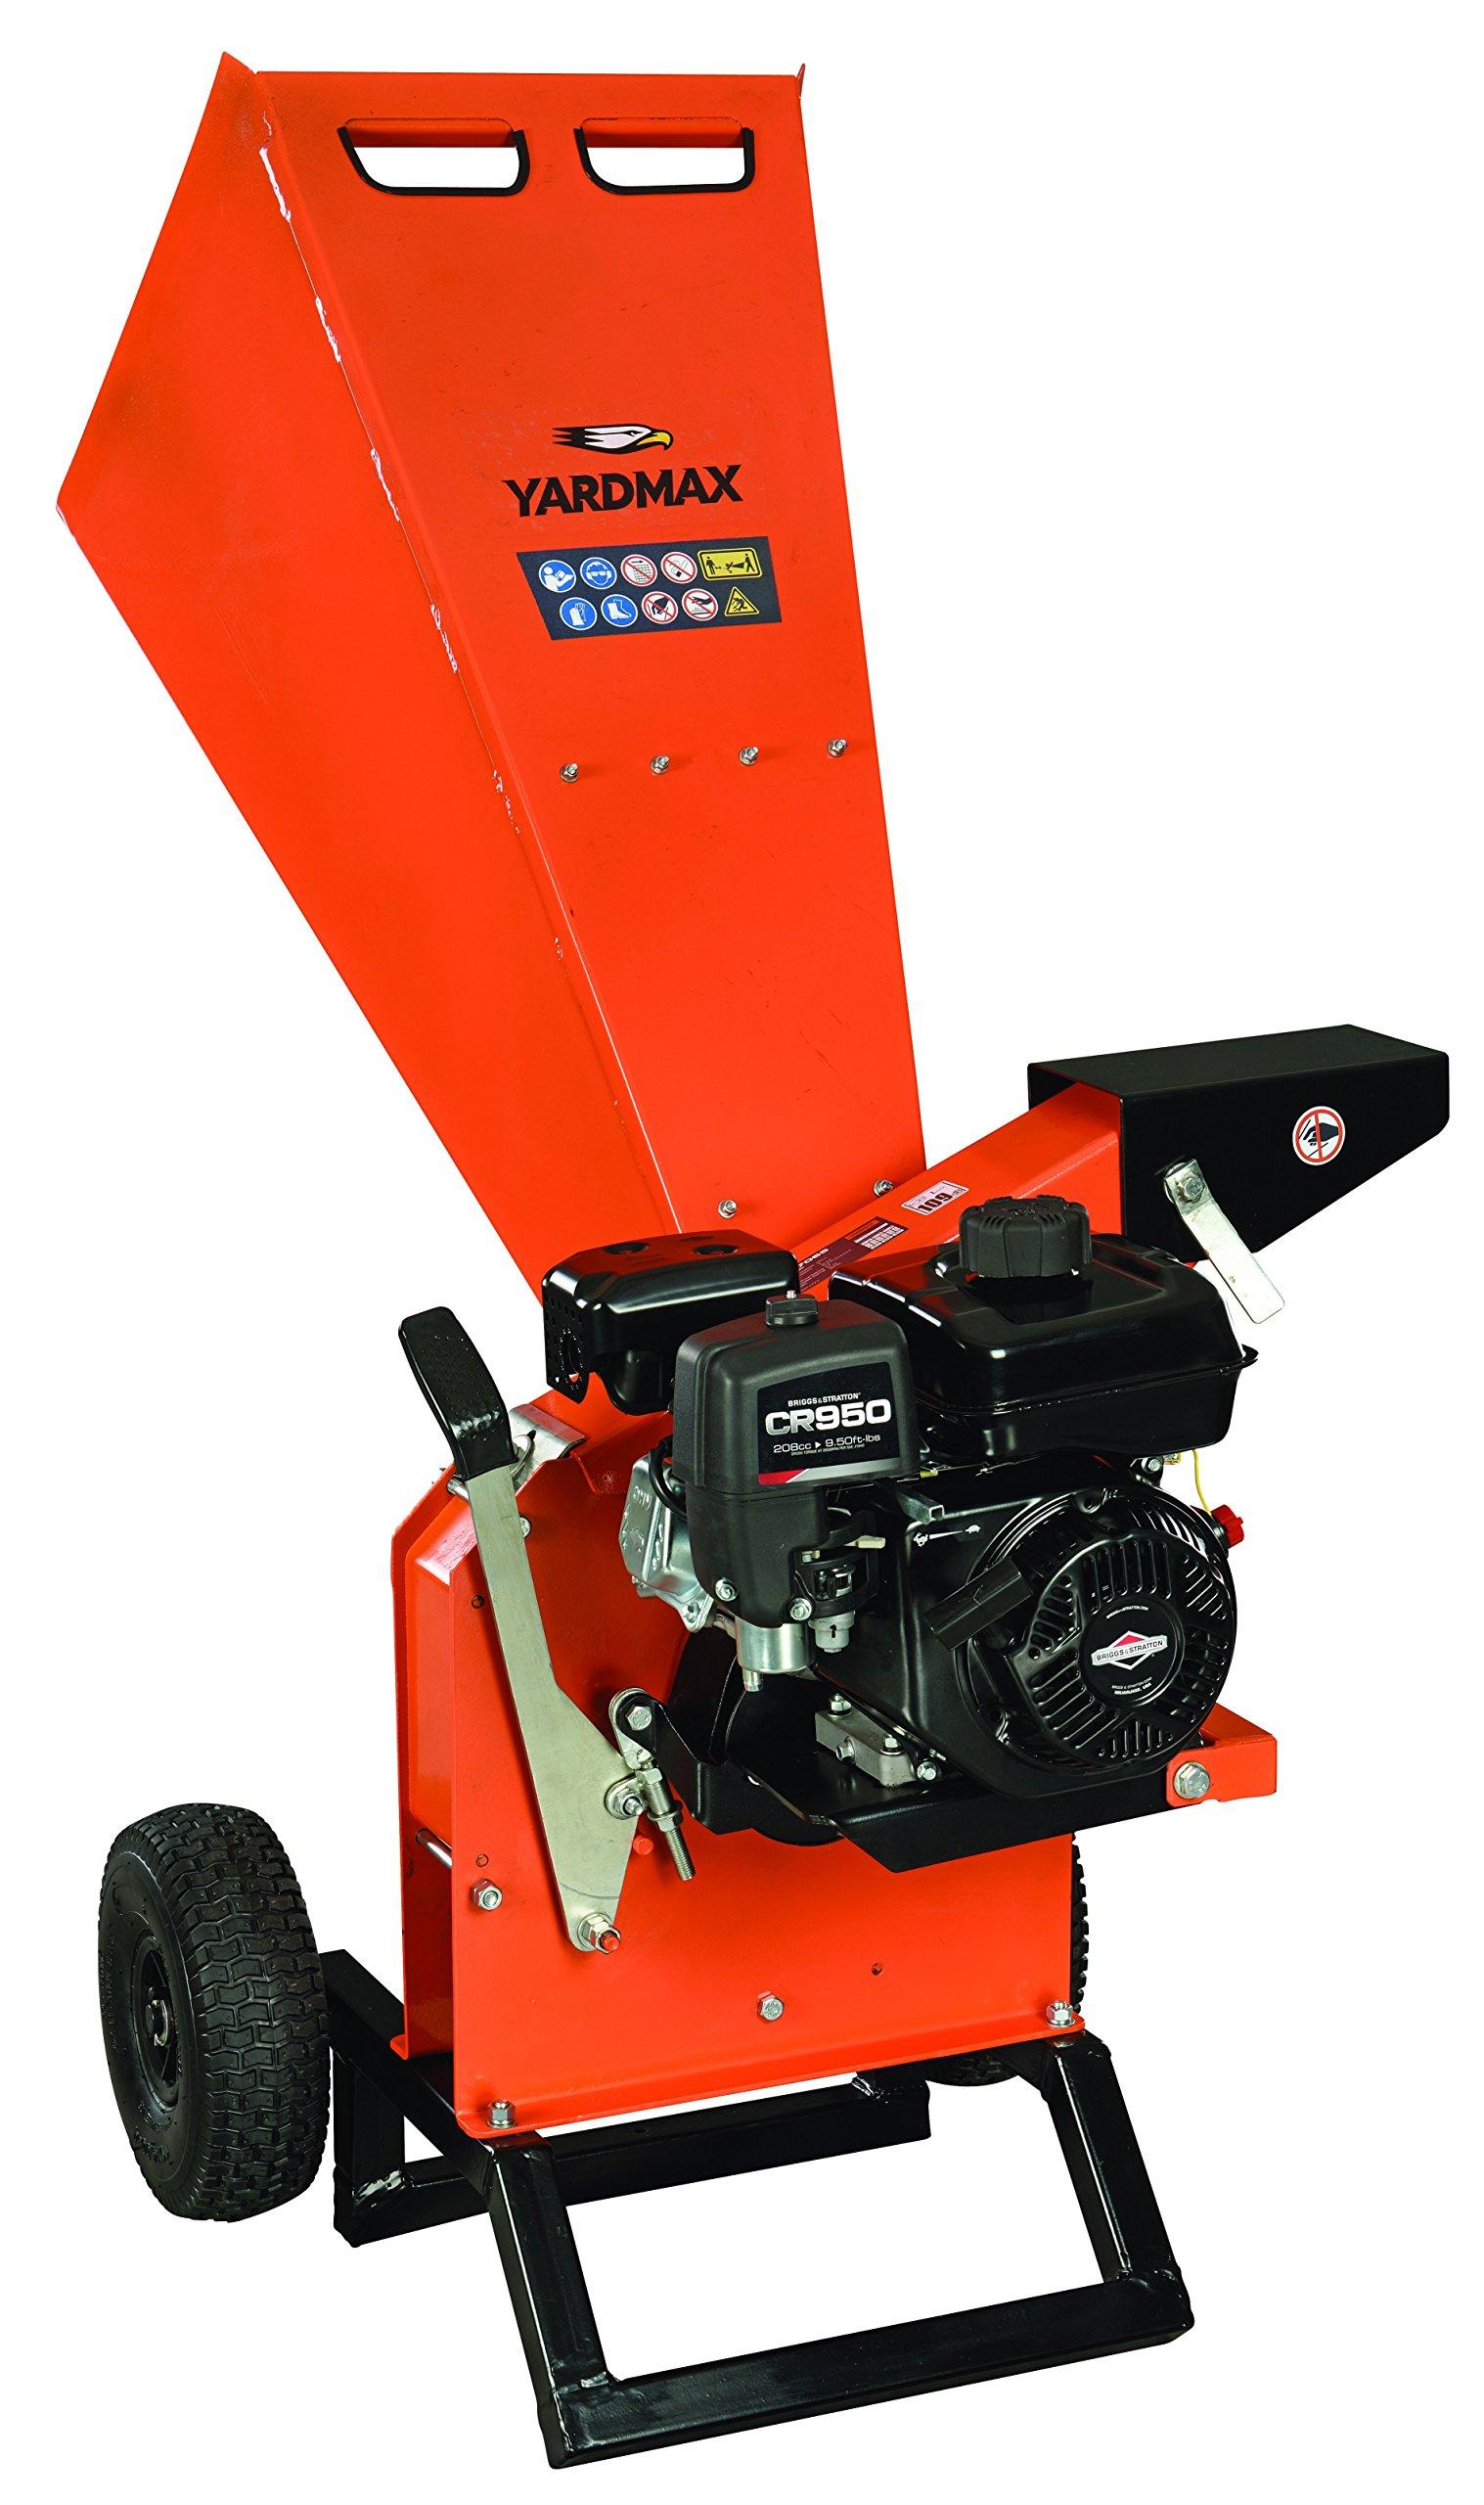 Get Quotations Yardmax Yw7565 Chipper Shredder 3 Diameter Briggs Stratton Cr950 6 5